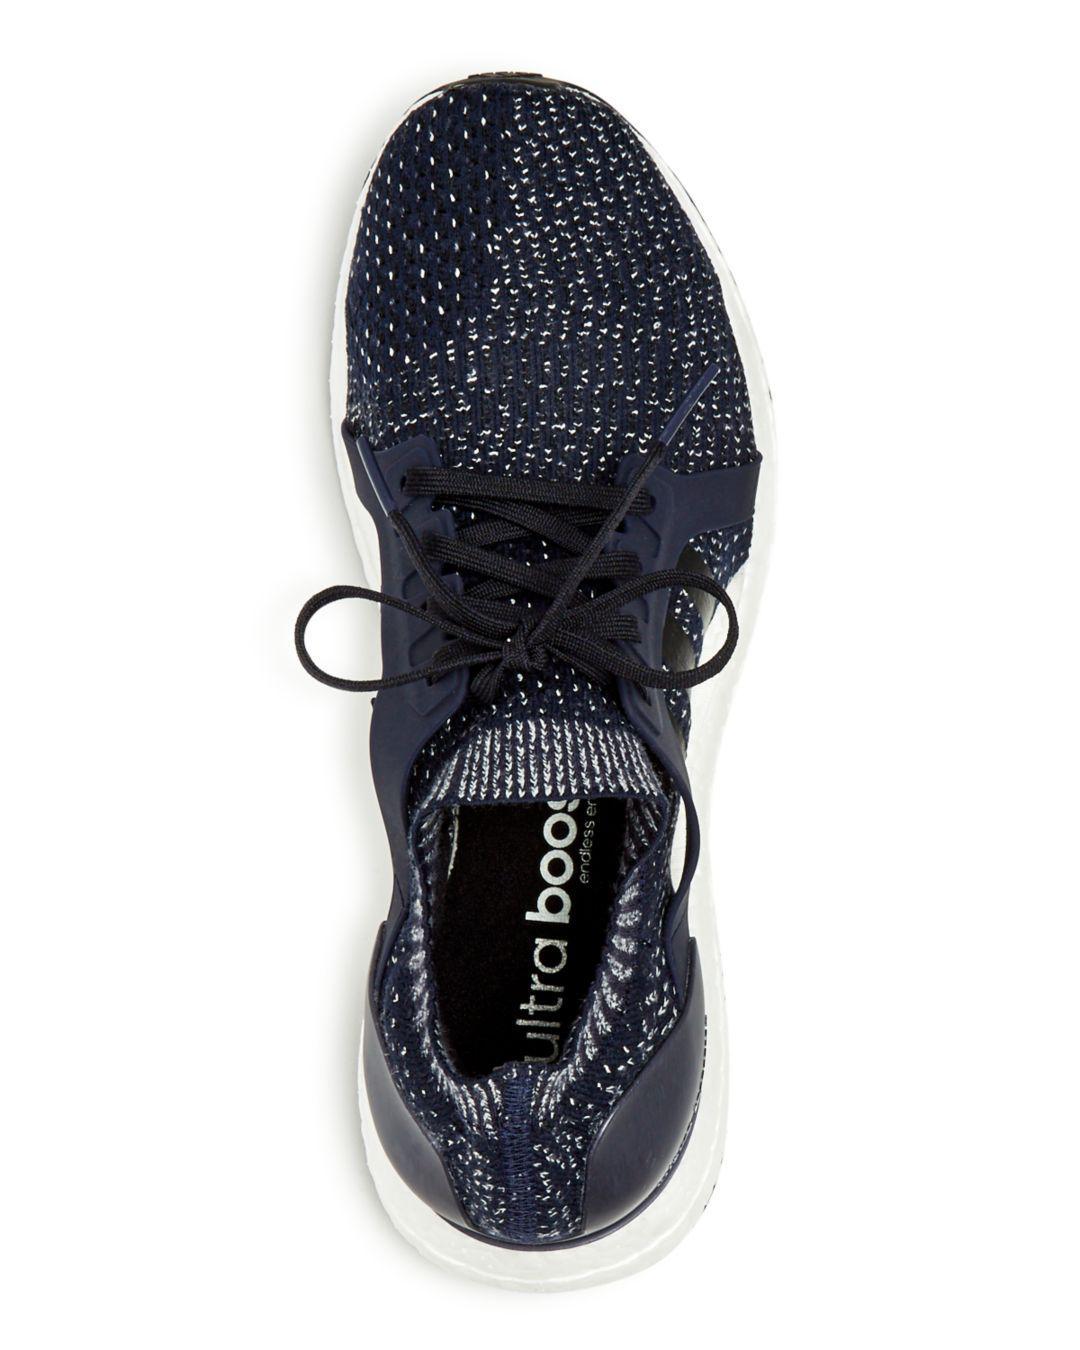 aa63fcae607a7 Adidas Womens Ultra Boost X Running Shoes Knit White - Style Guru ...